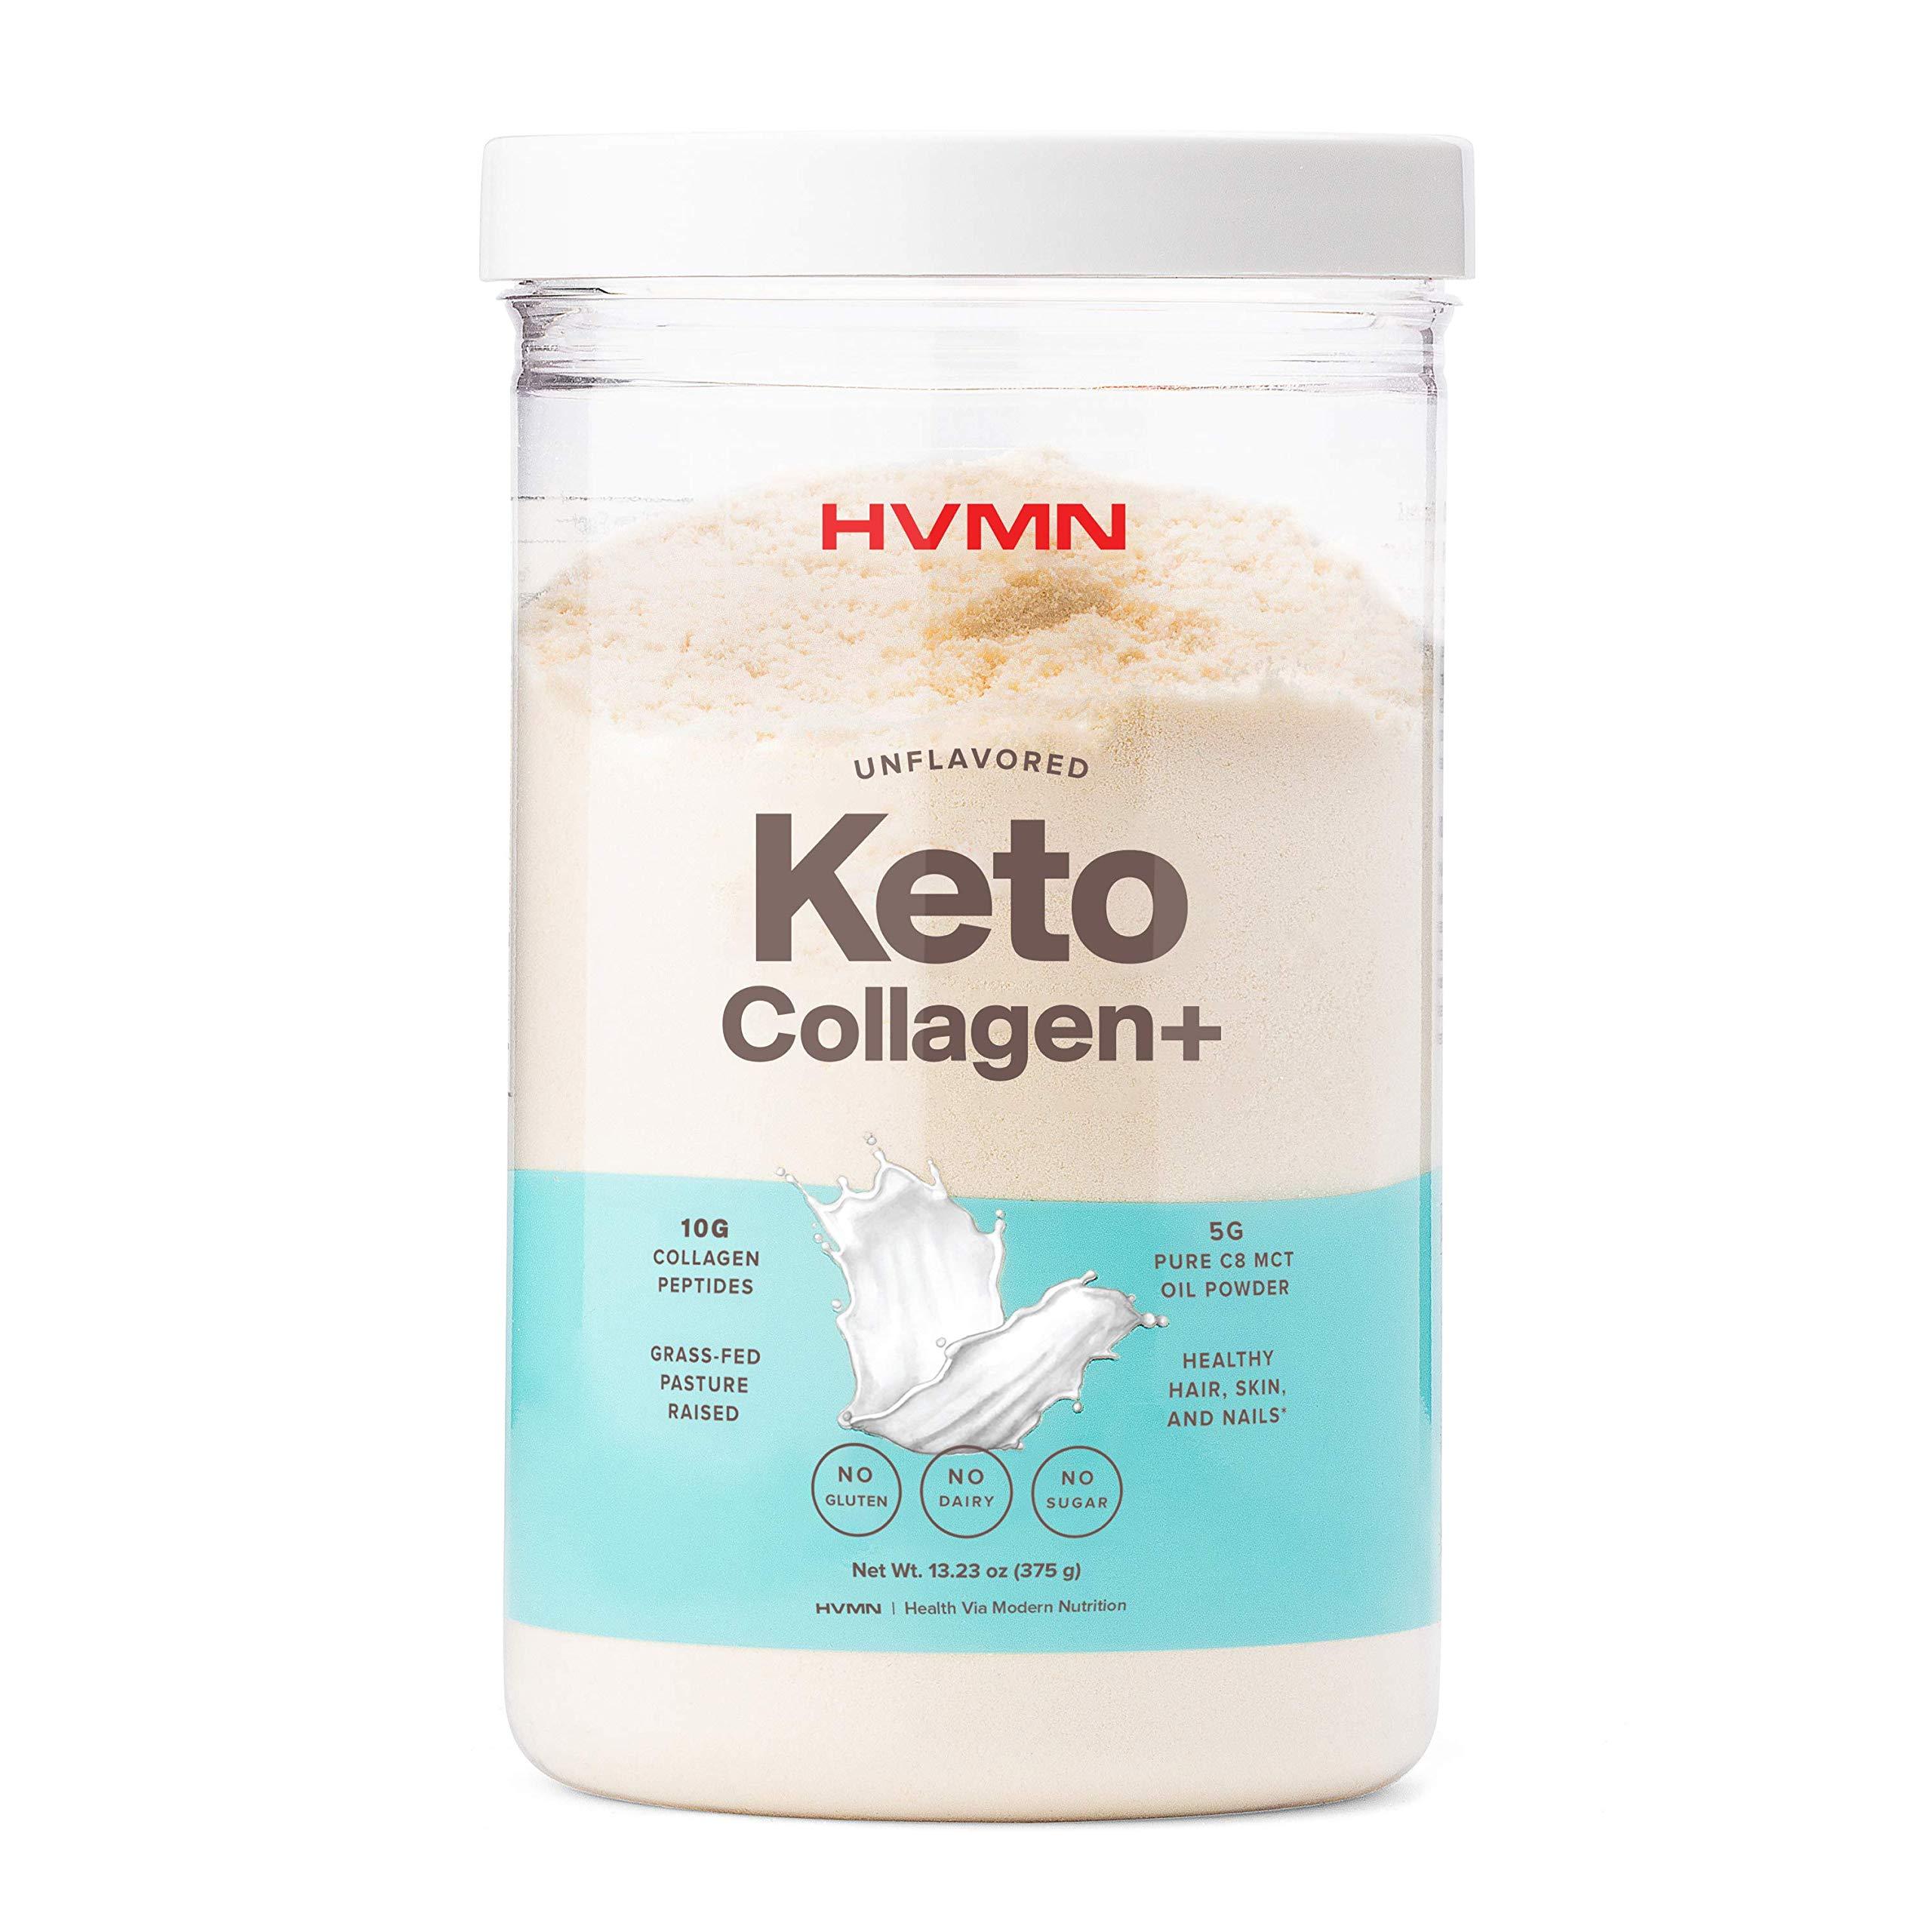 H.V.M.N. Keto Collagen+ Protein Powder: Collagen Supplement with Collagen Peptides & MCT Powder - Keto Diet Approved - 25 Servings (Unflavored)